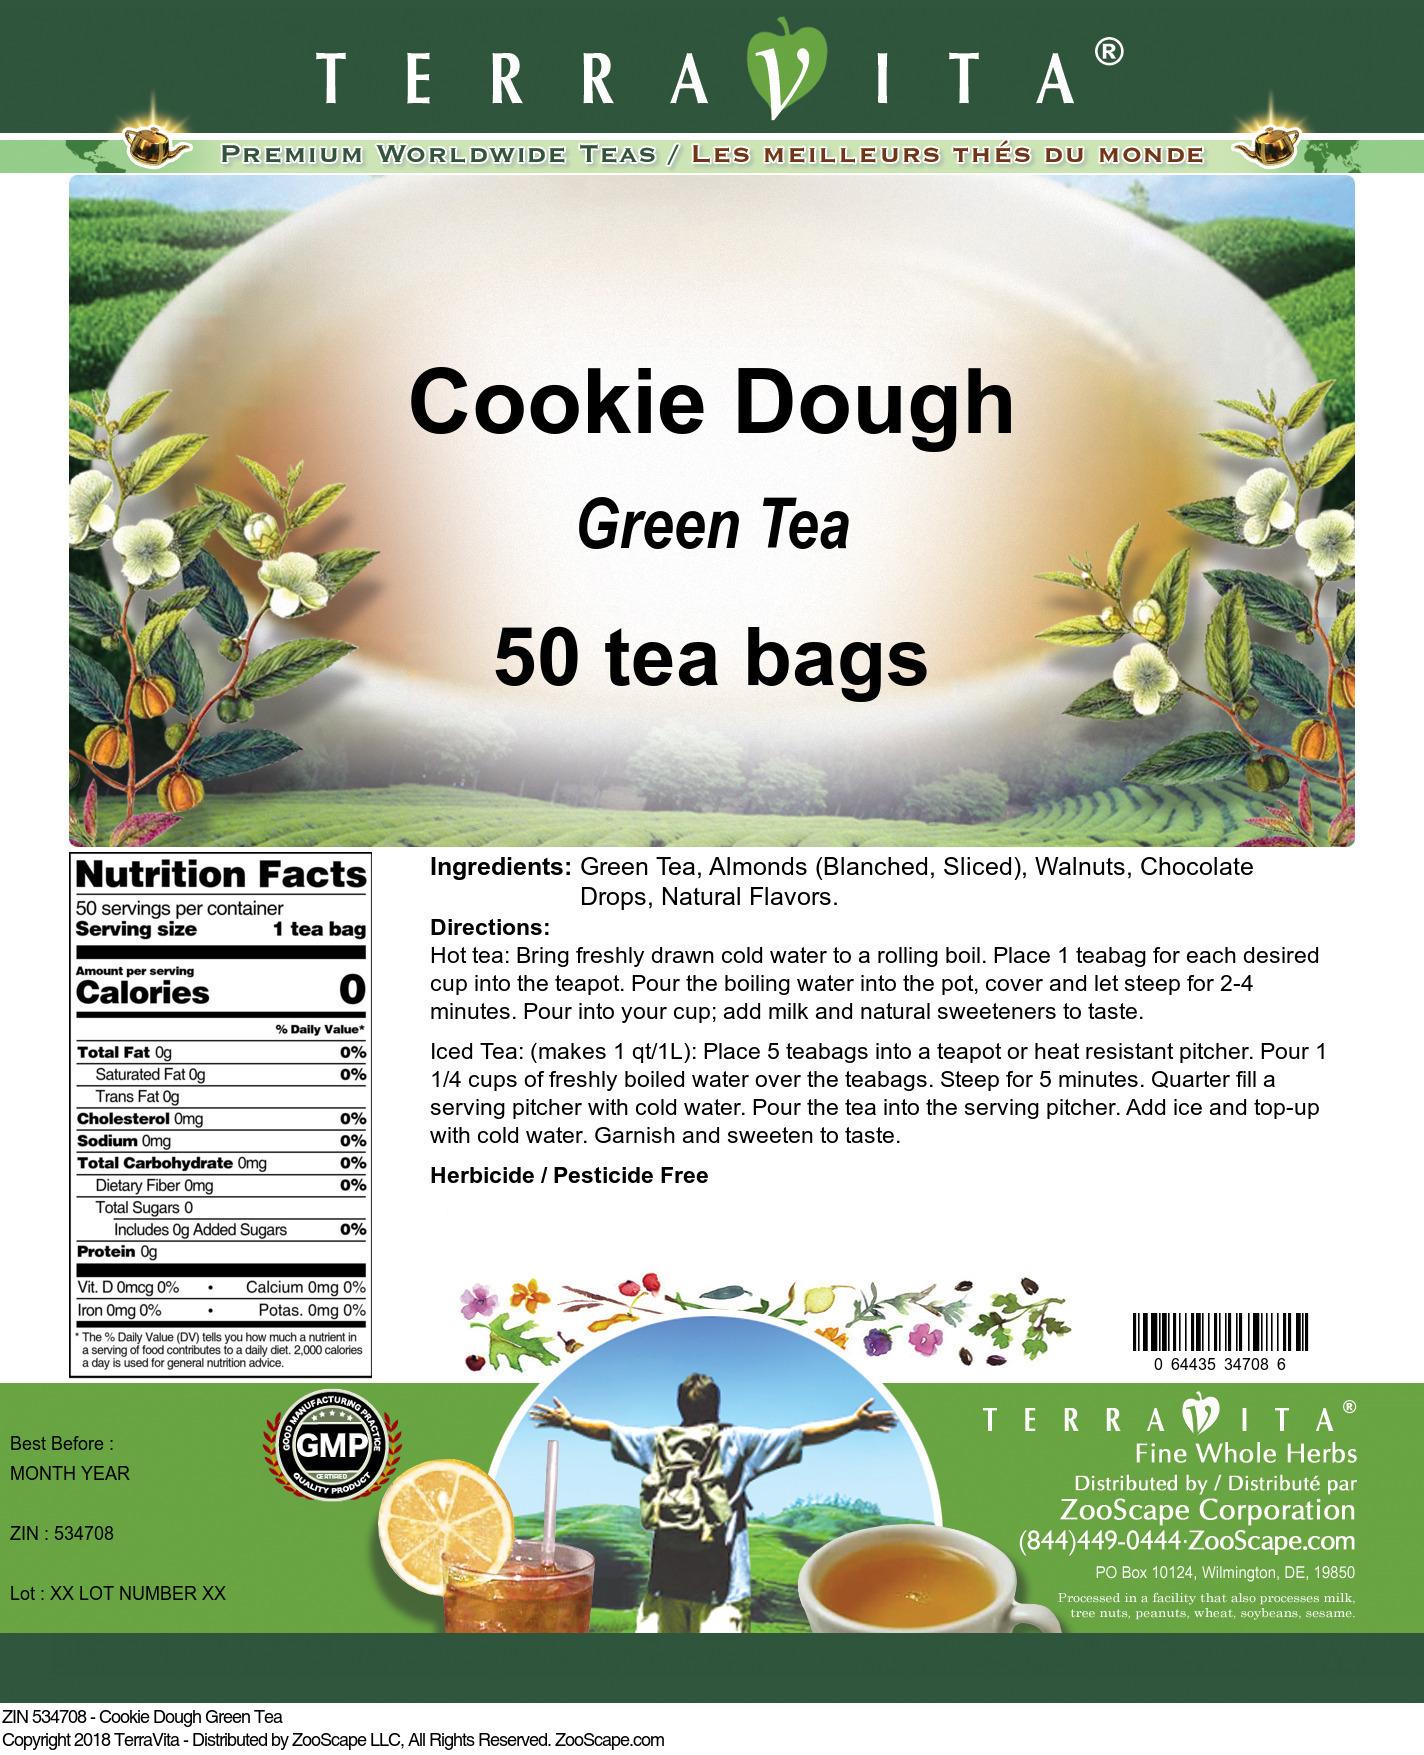 Cookie Dough Green Tea